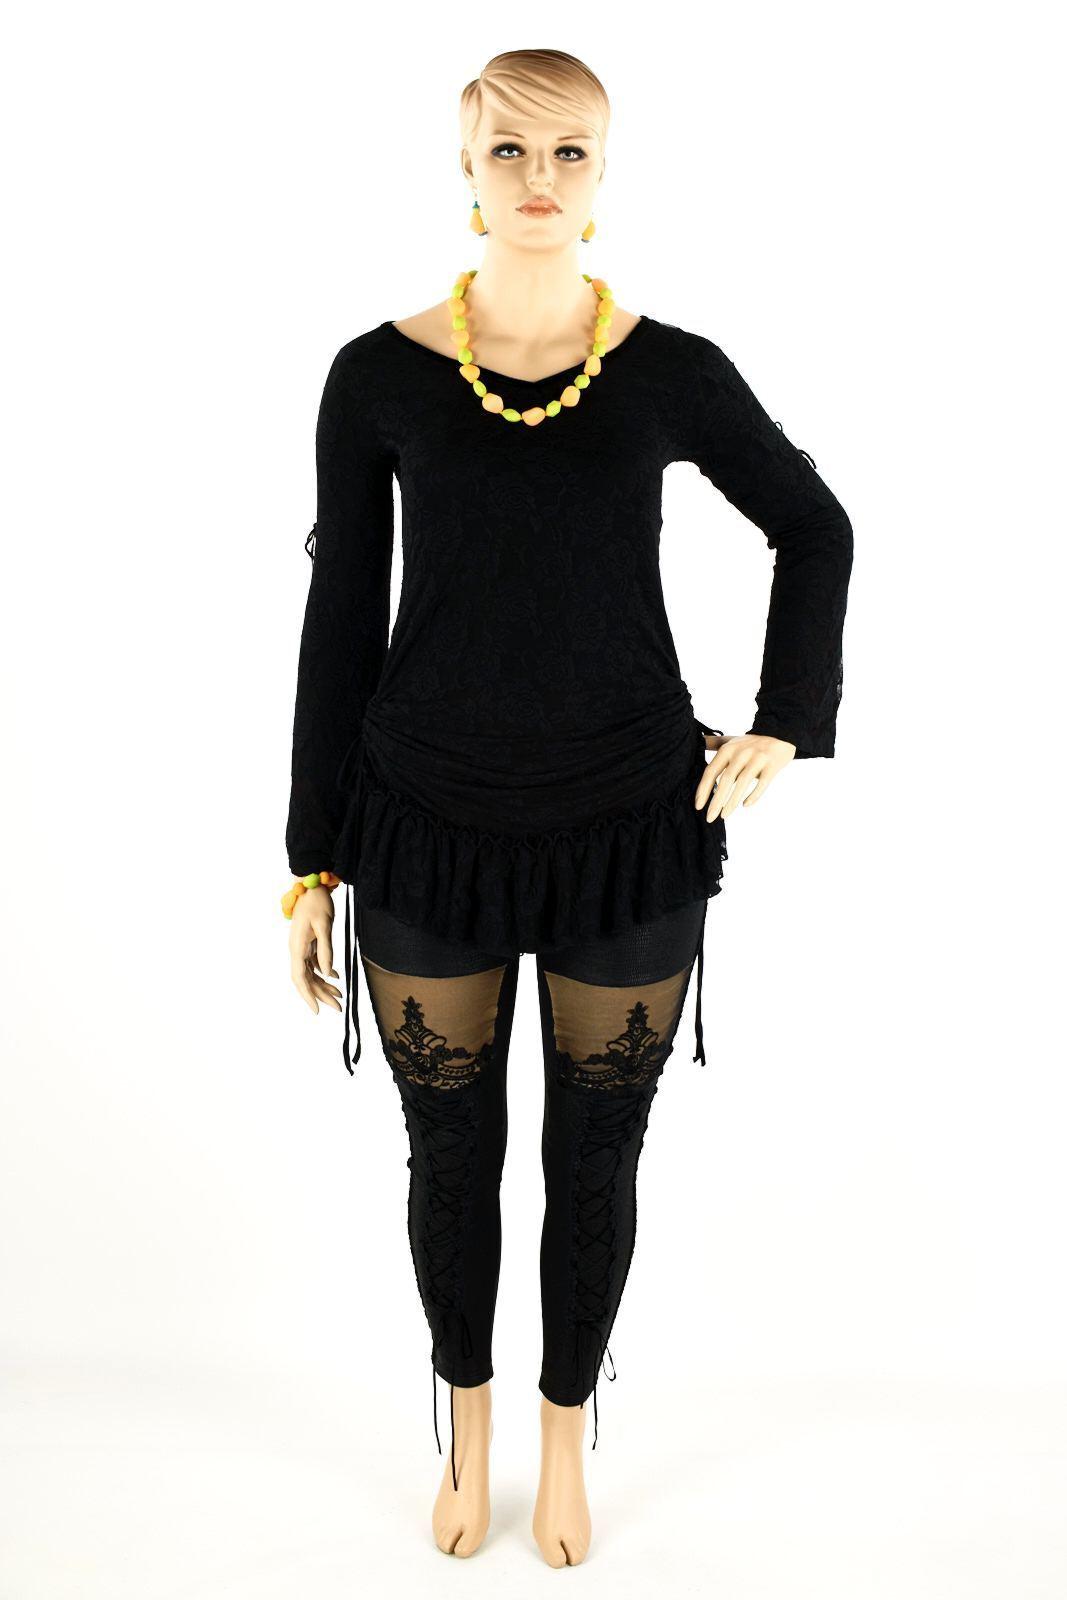 Gothic Gothic Gothic Fashion Stretch Stripe leggings nero, foderato-XS-XXXL-Punk 5c4c7c